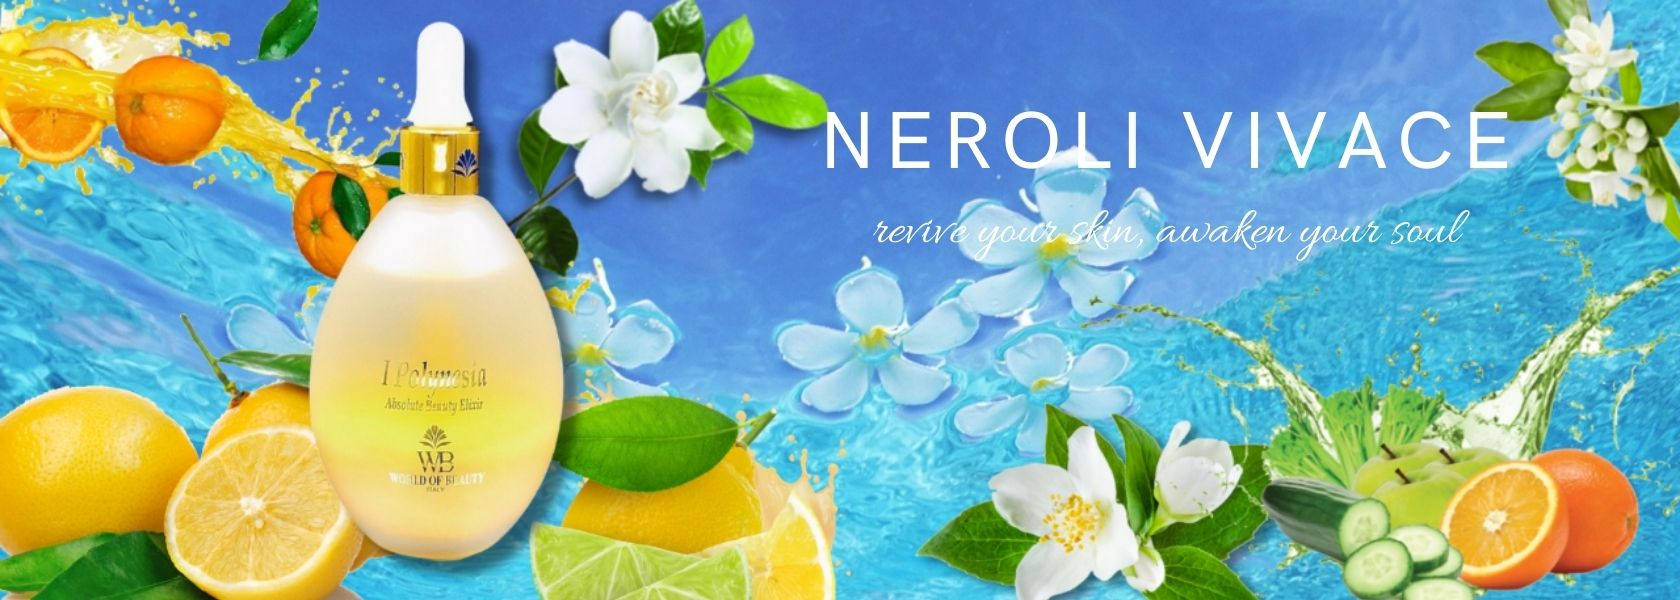 neroli vivace elixir